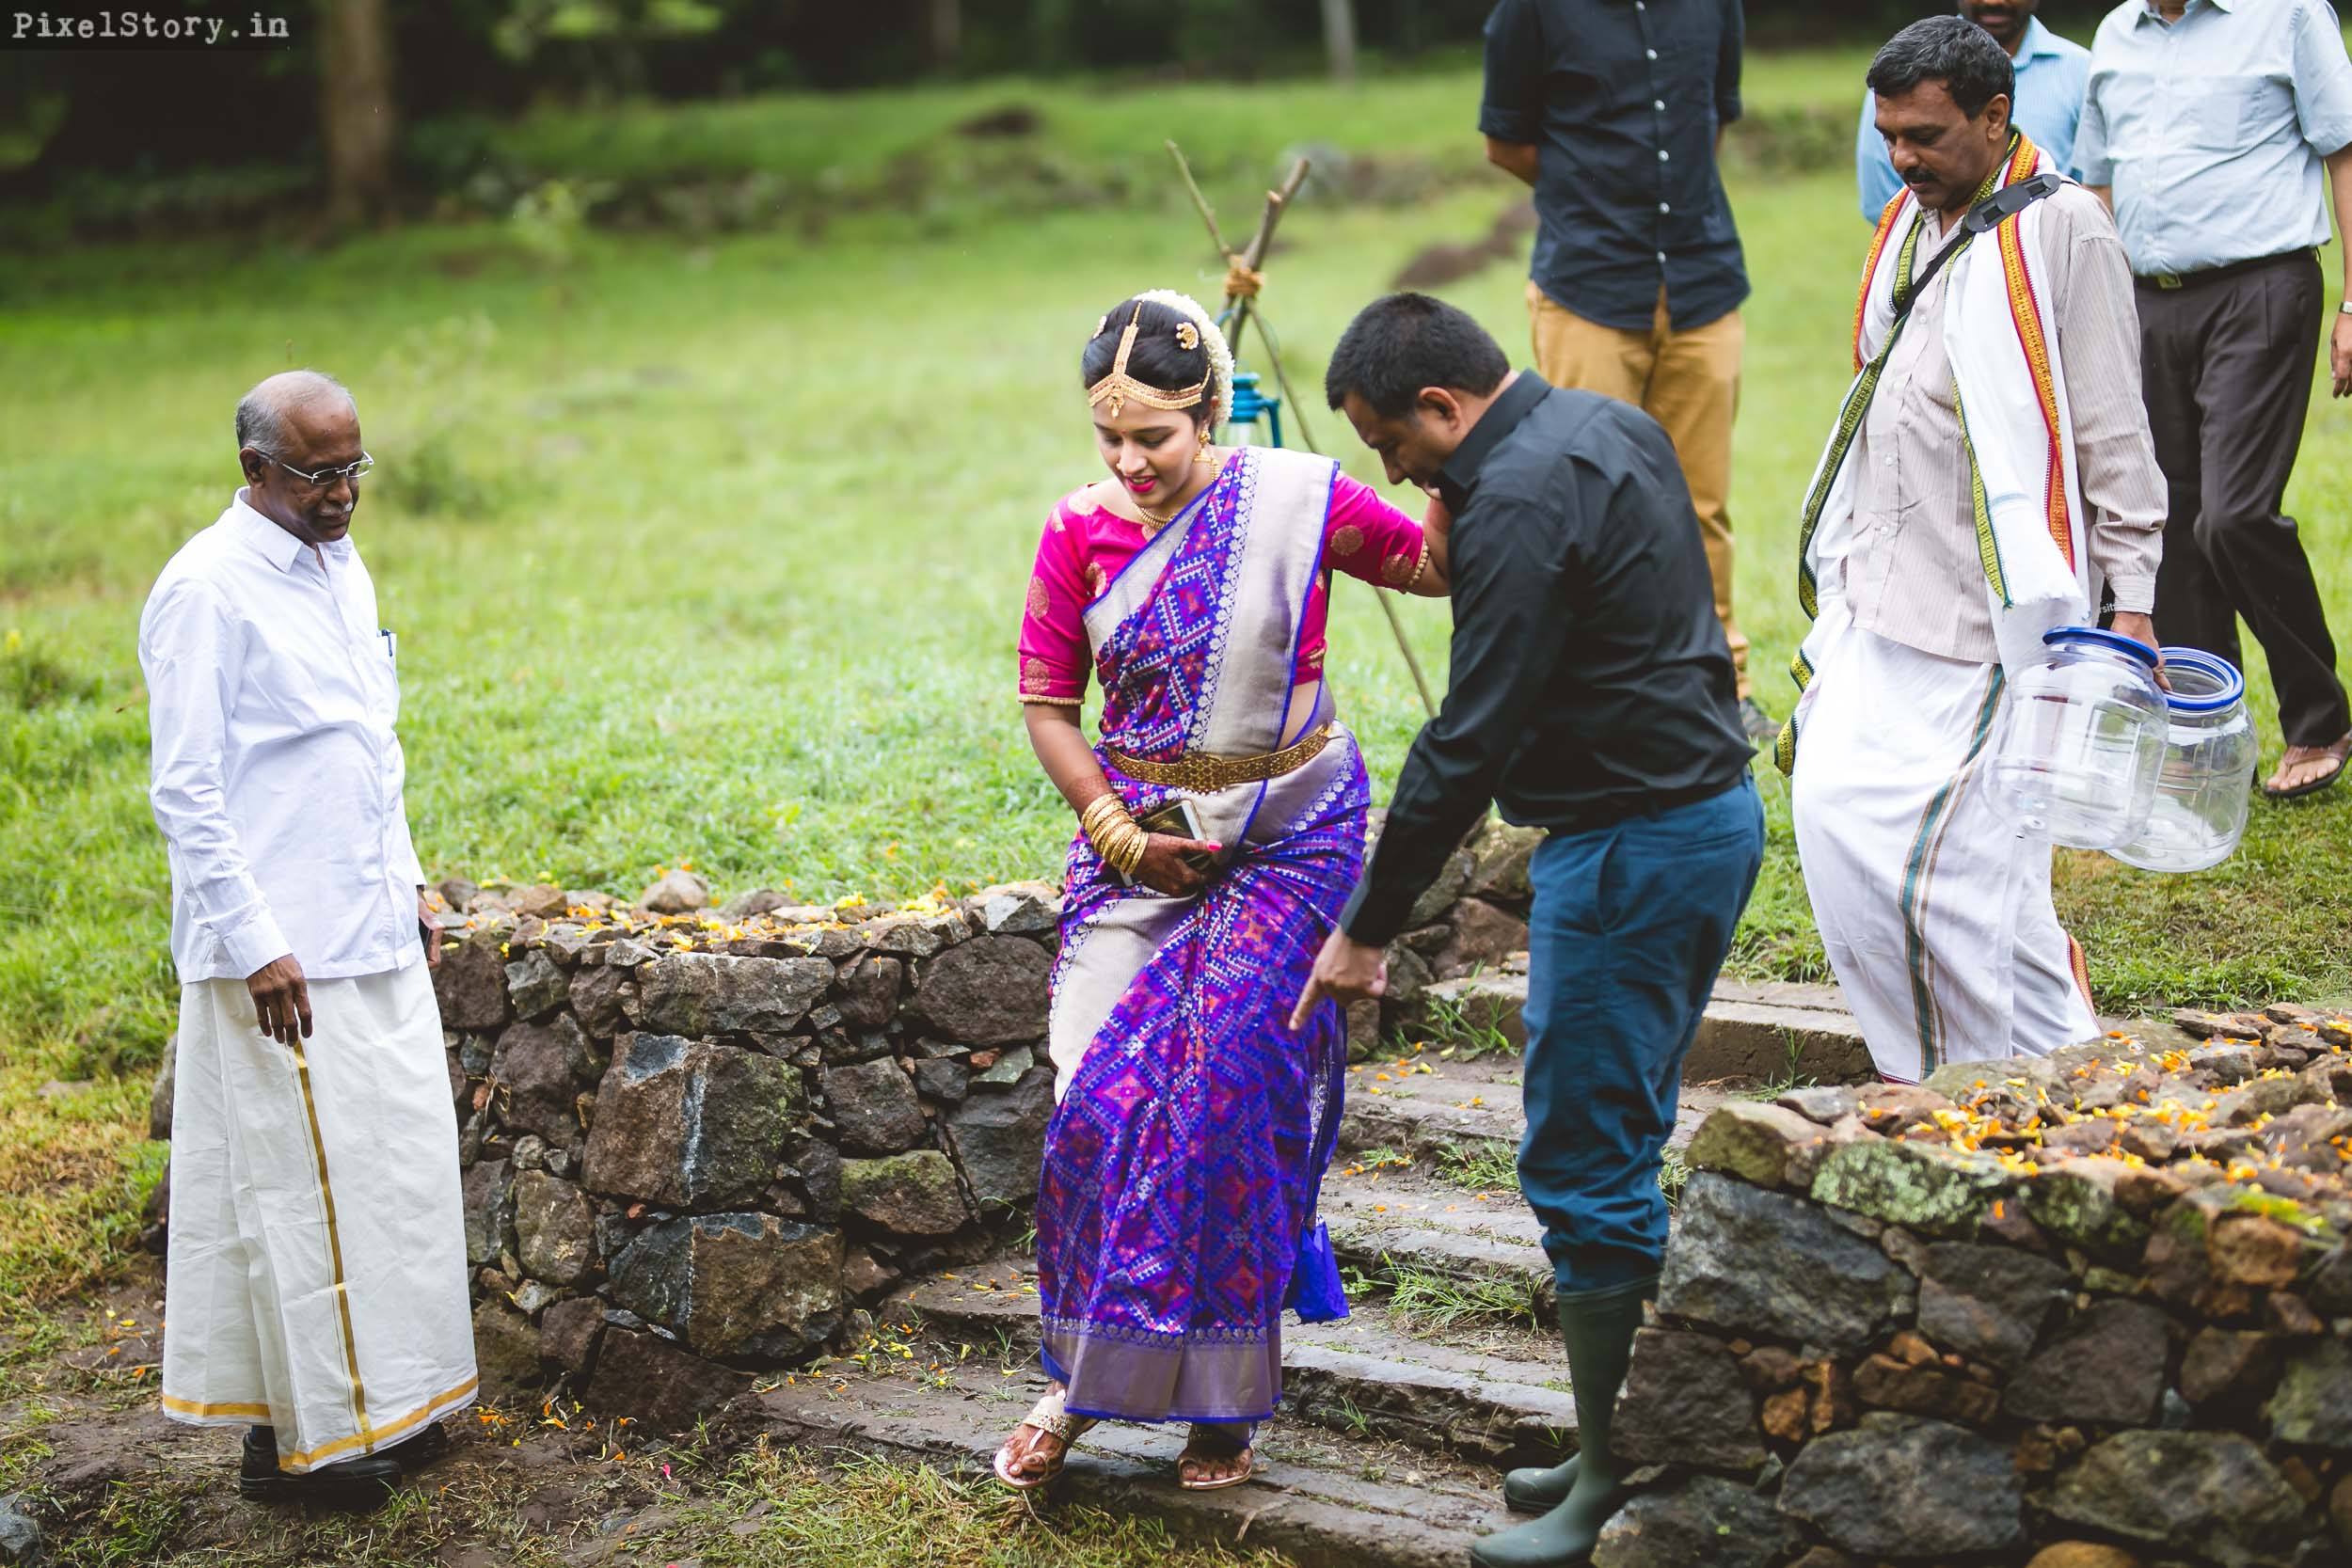 PixelStory-Jungle-Wedding-Photographer-Masinagudi-Indo-French022.jpg